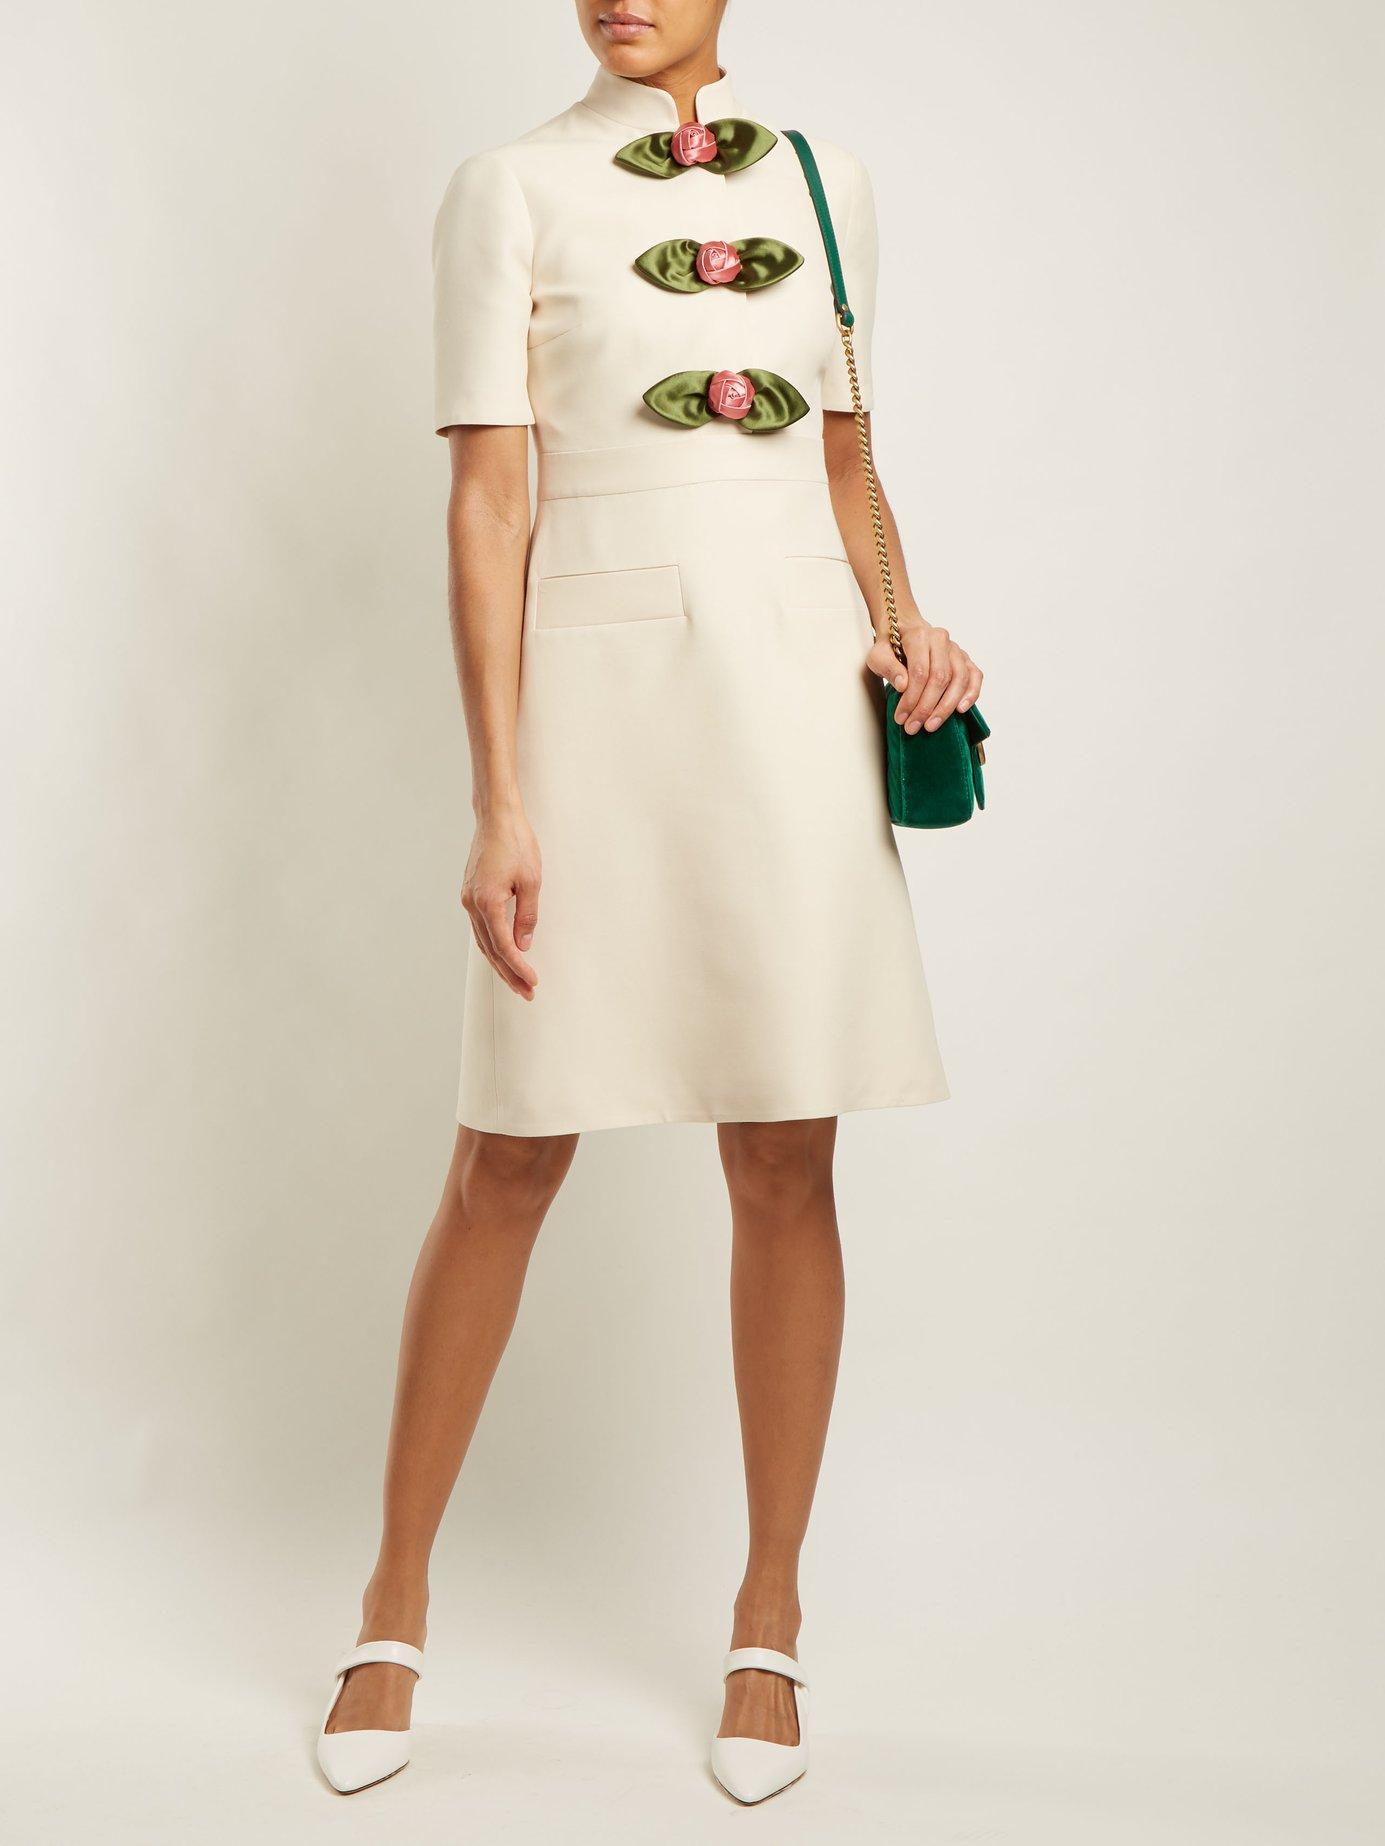 Rose-embellished high-neck wool-blend dress by Gucci